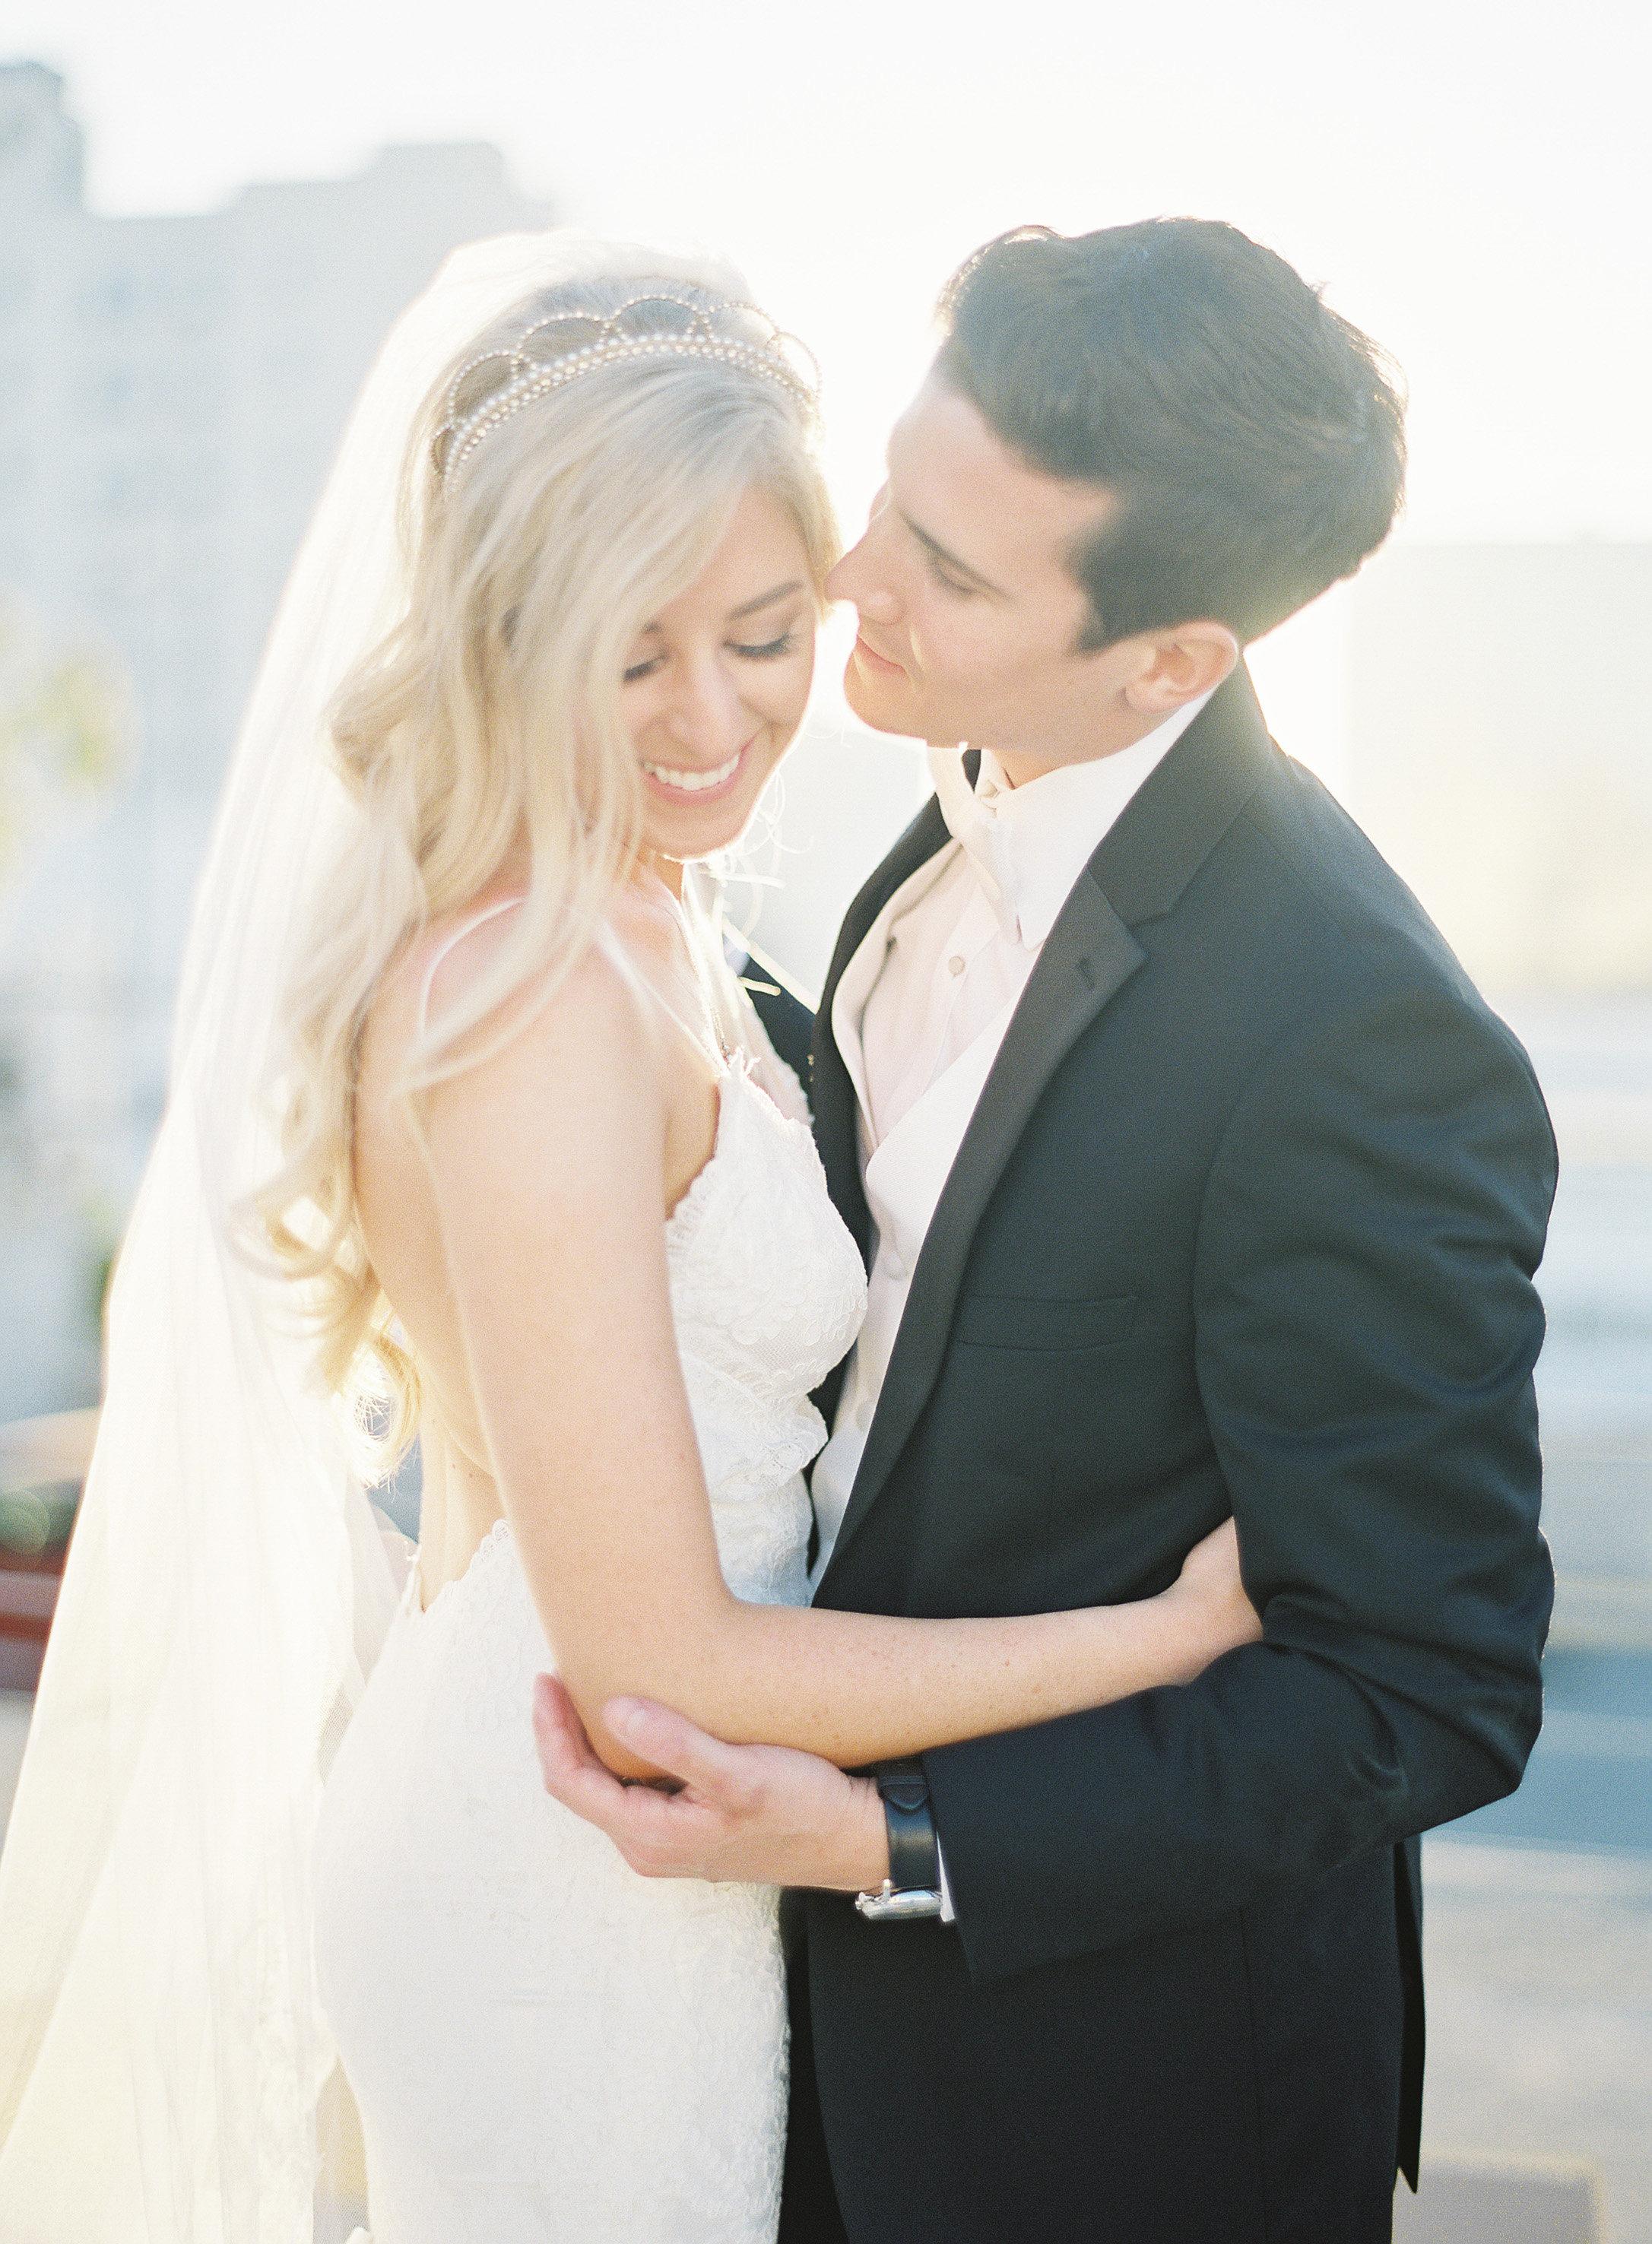 James and Rachel-Bride and Groom-0104.jpg